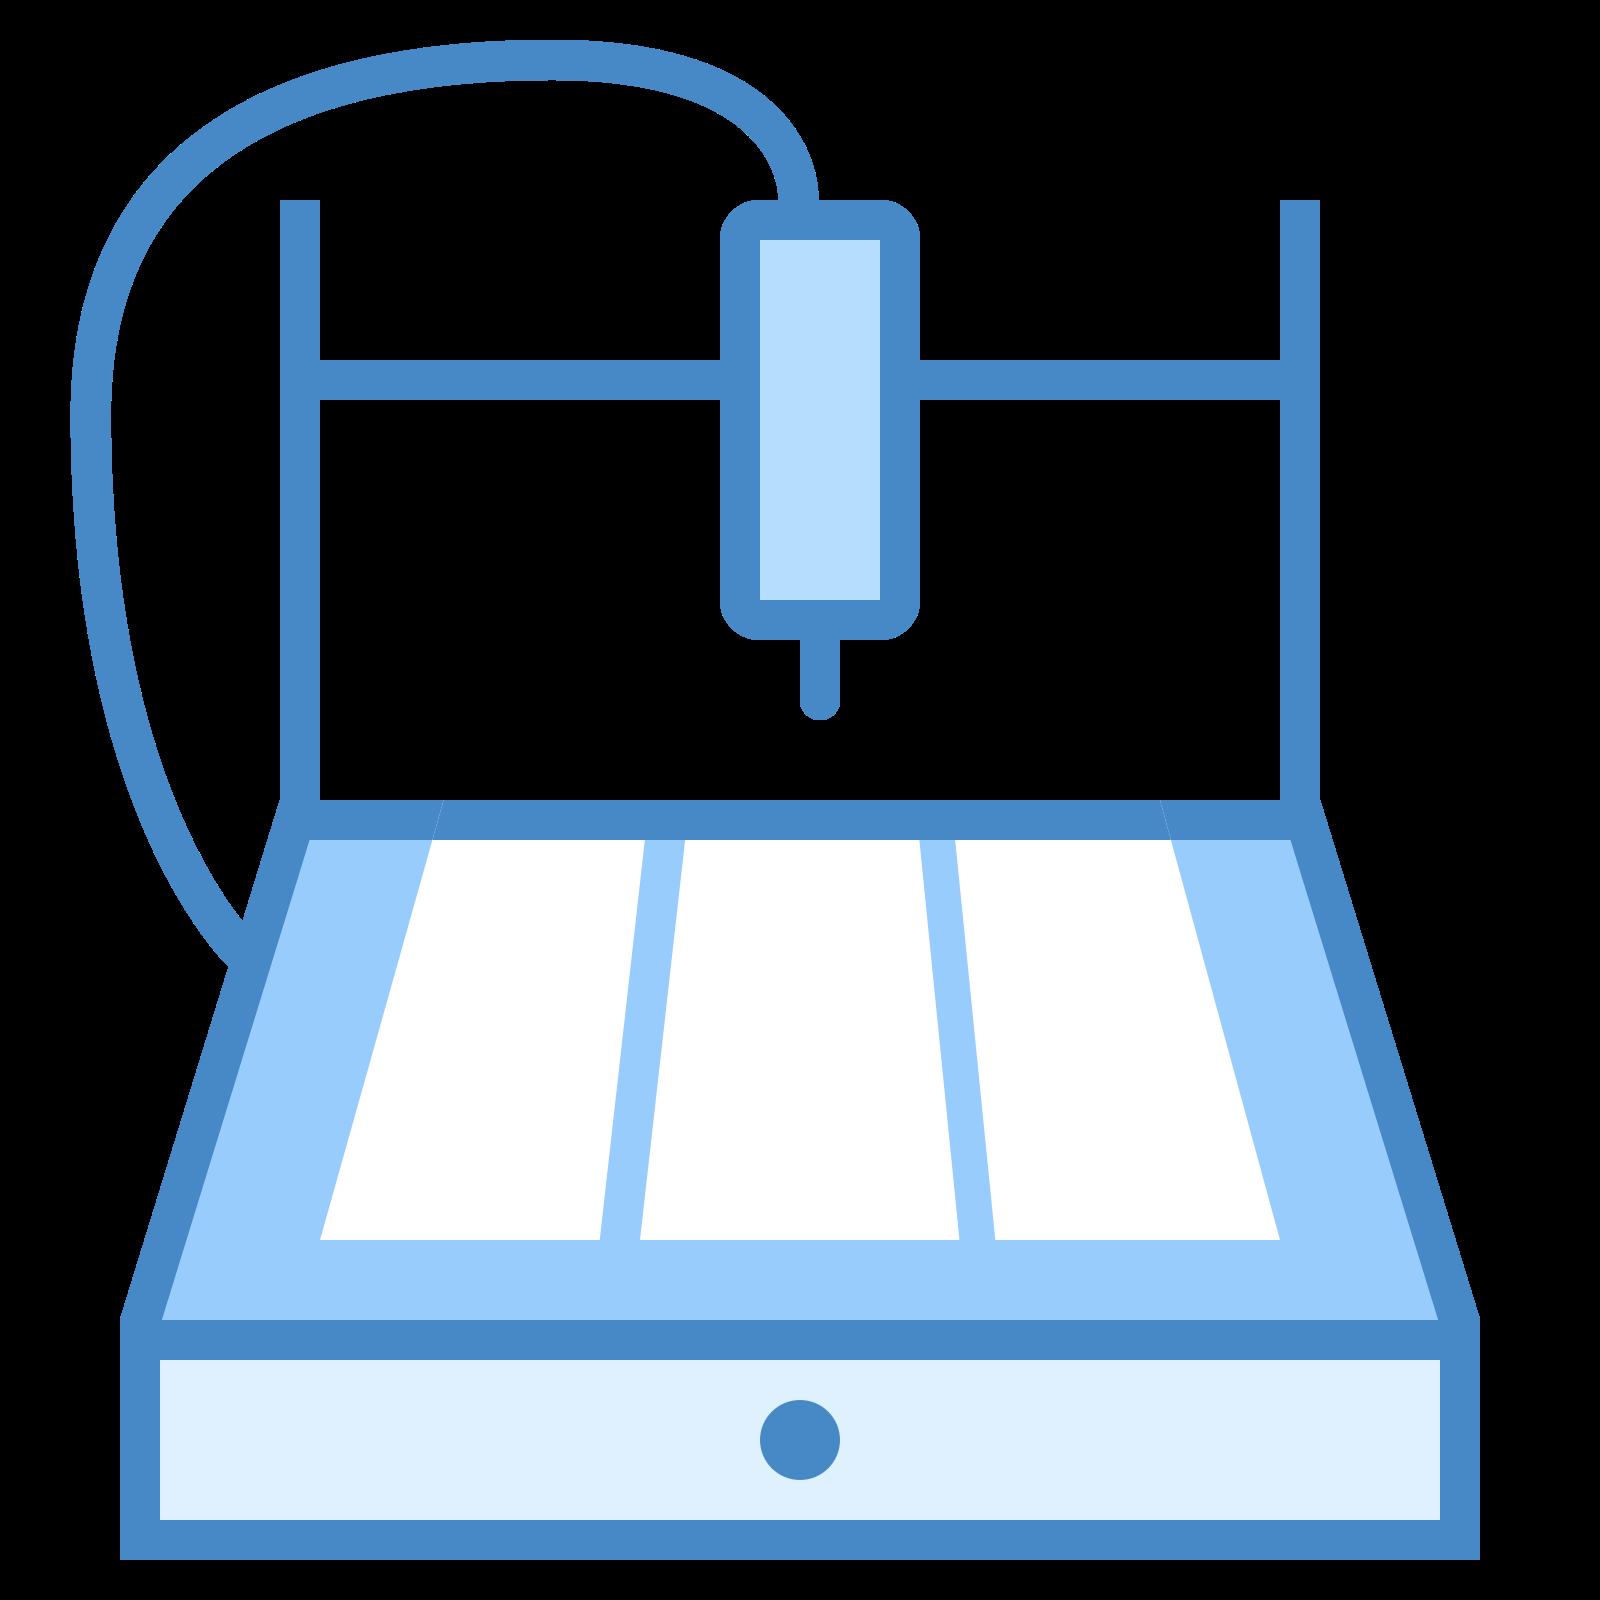 CNC Machine icon